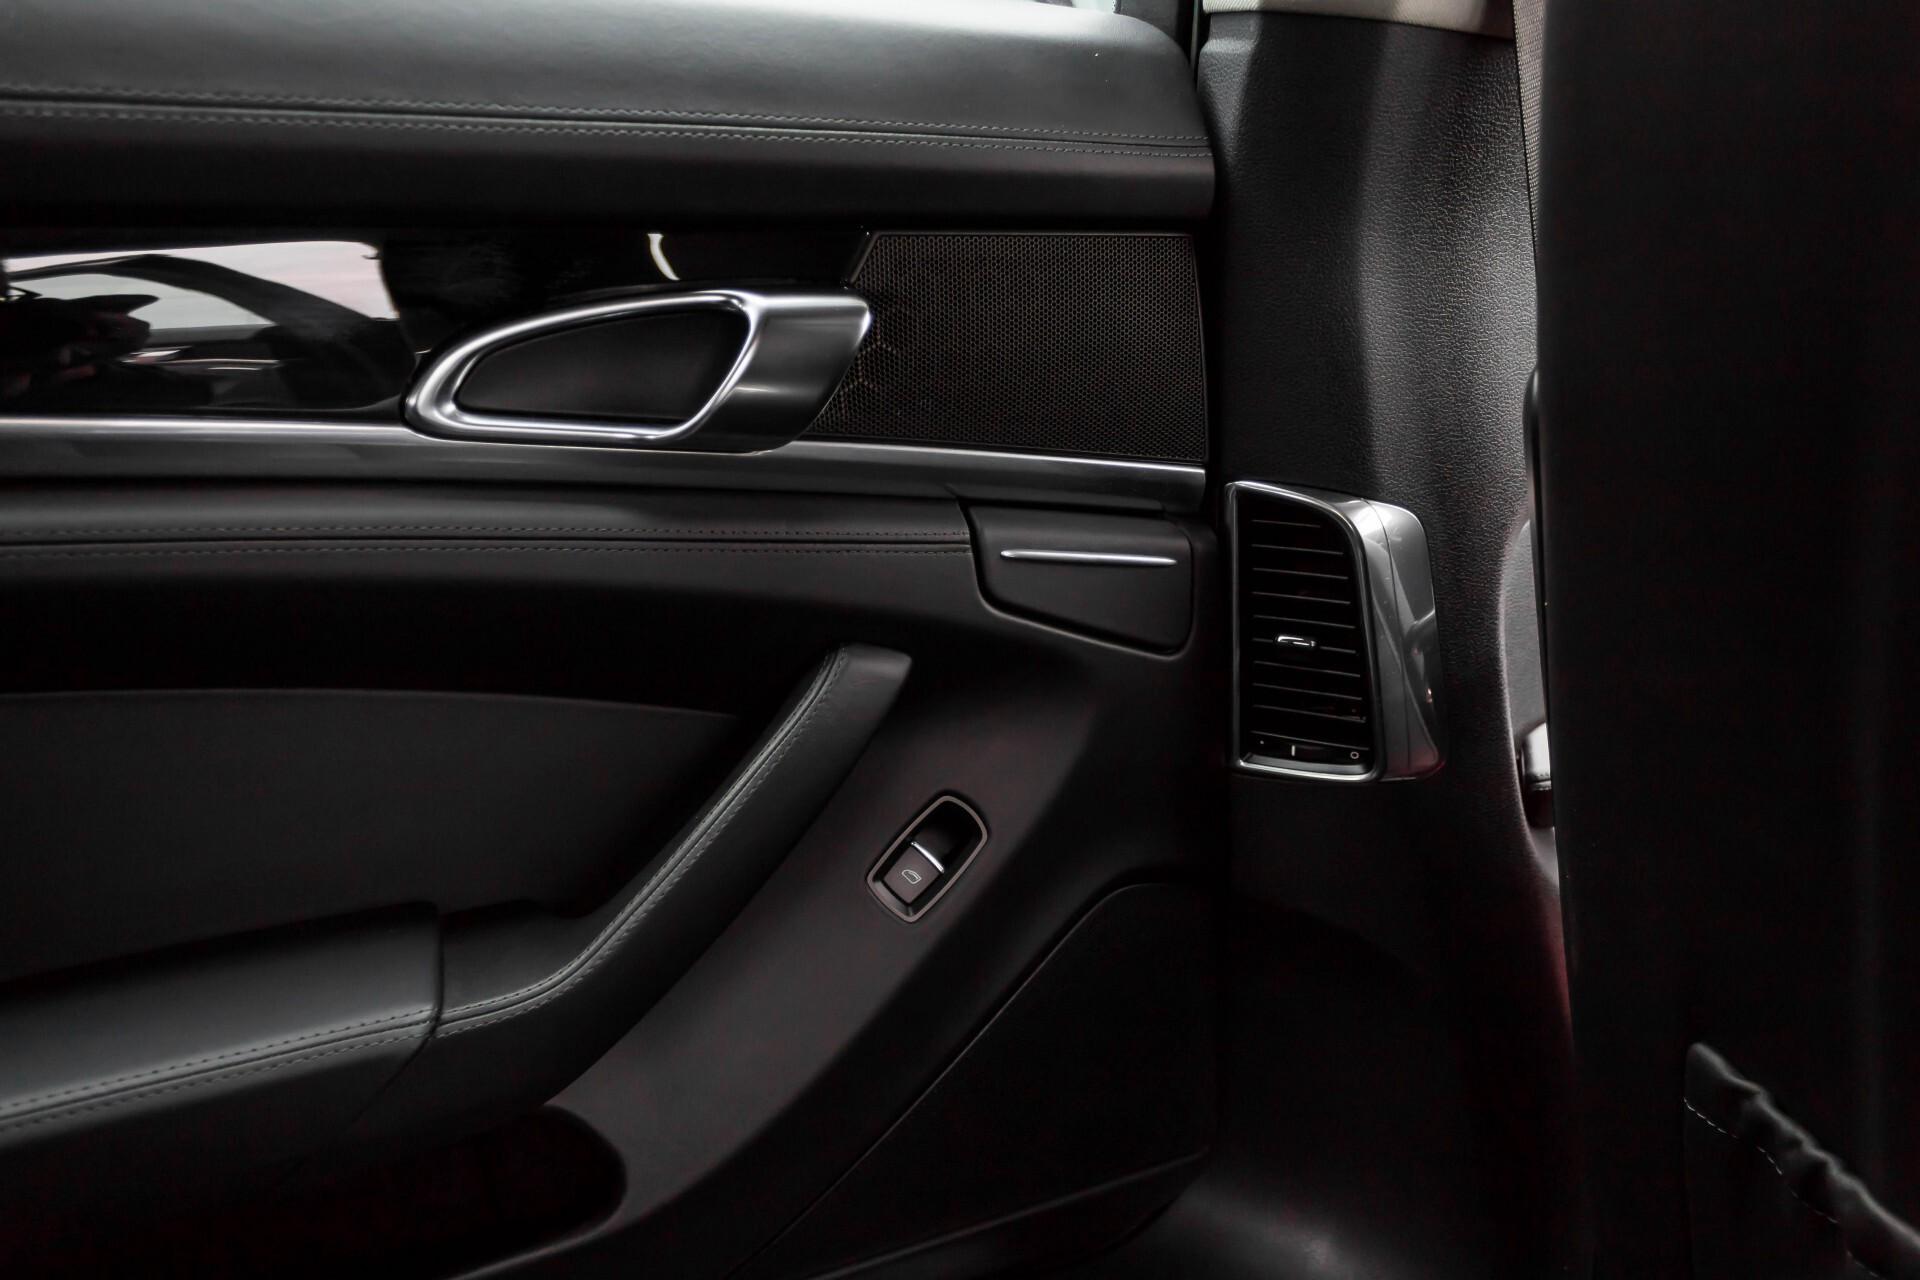 Porsche Panamera 3.6 4 Sportchrono/Luchtvering/Dak/Nappa/Aut7 Foto 34